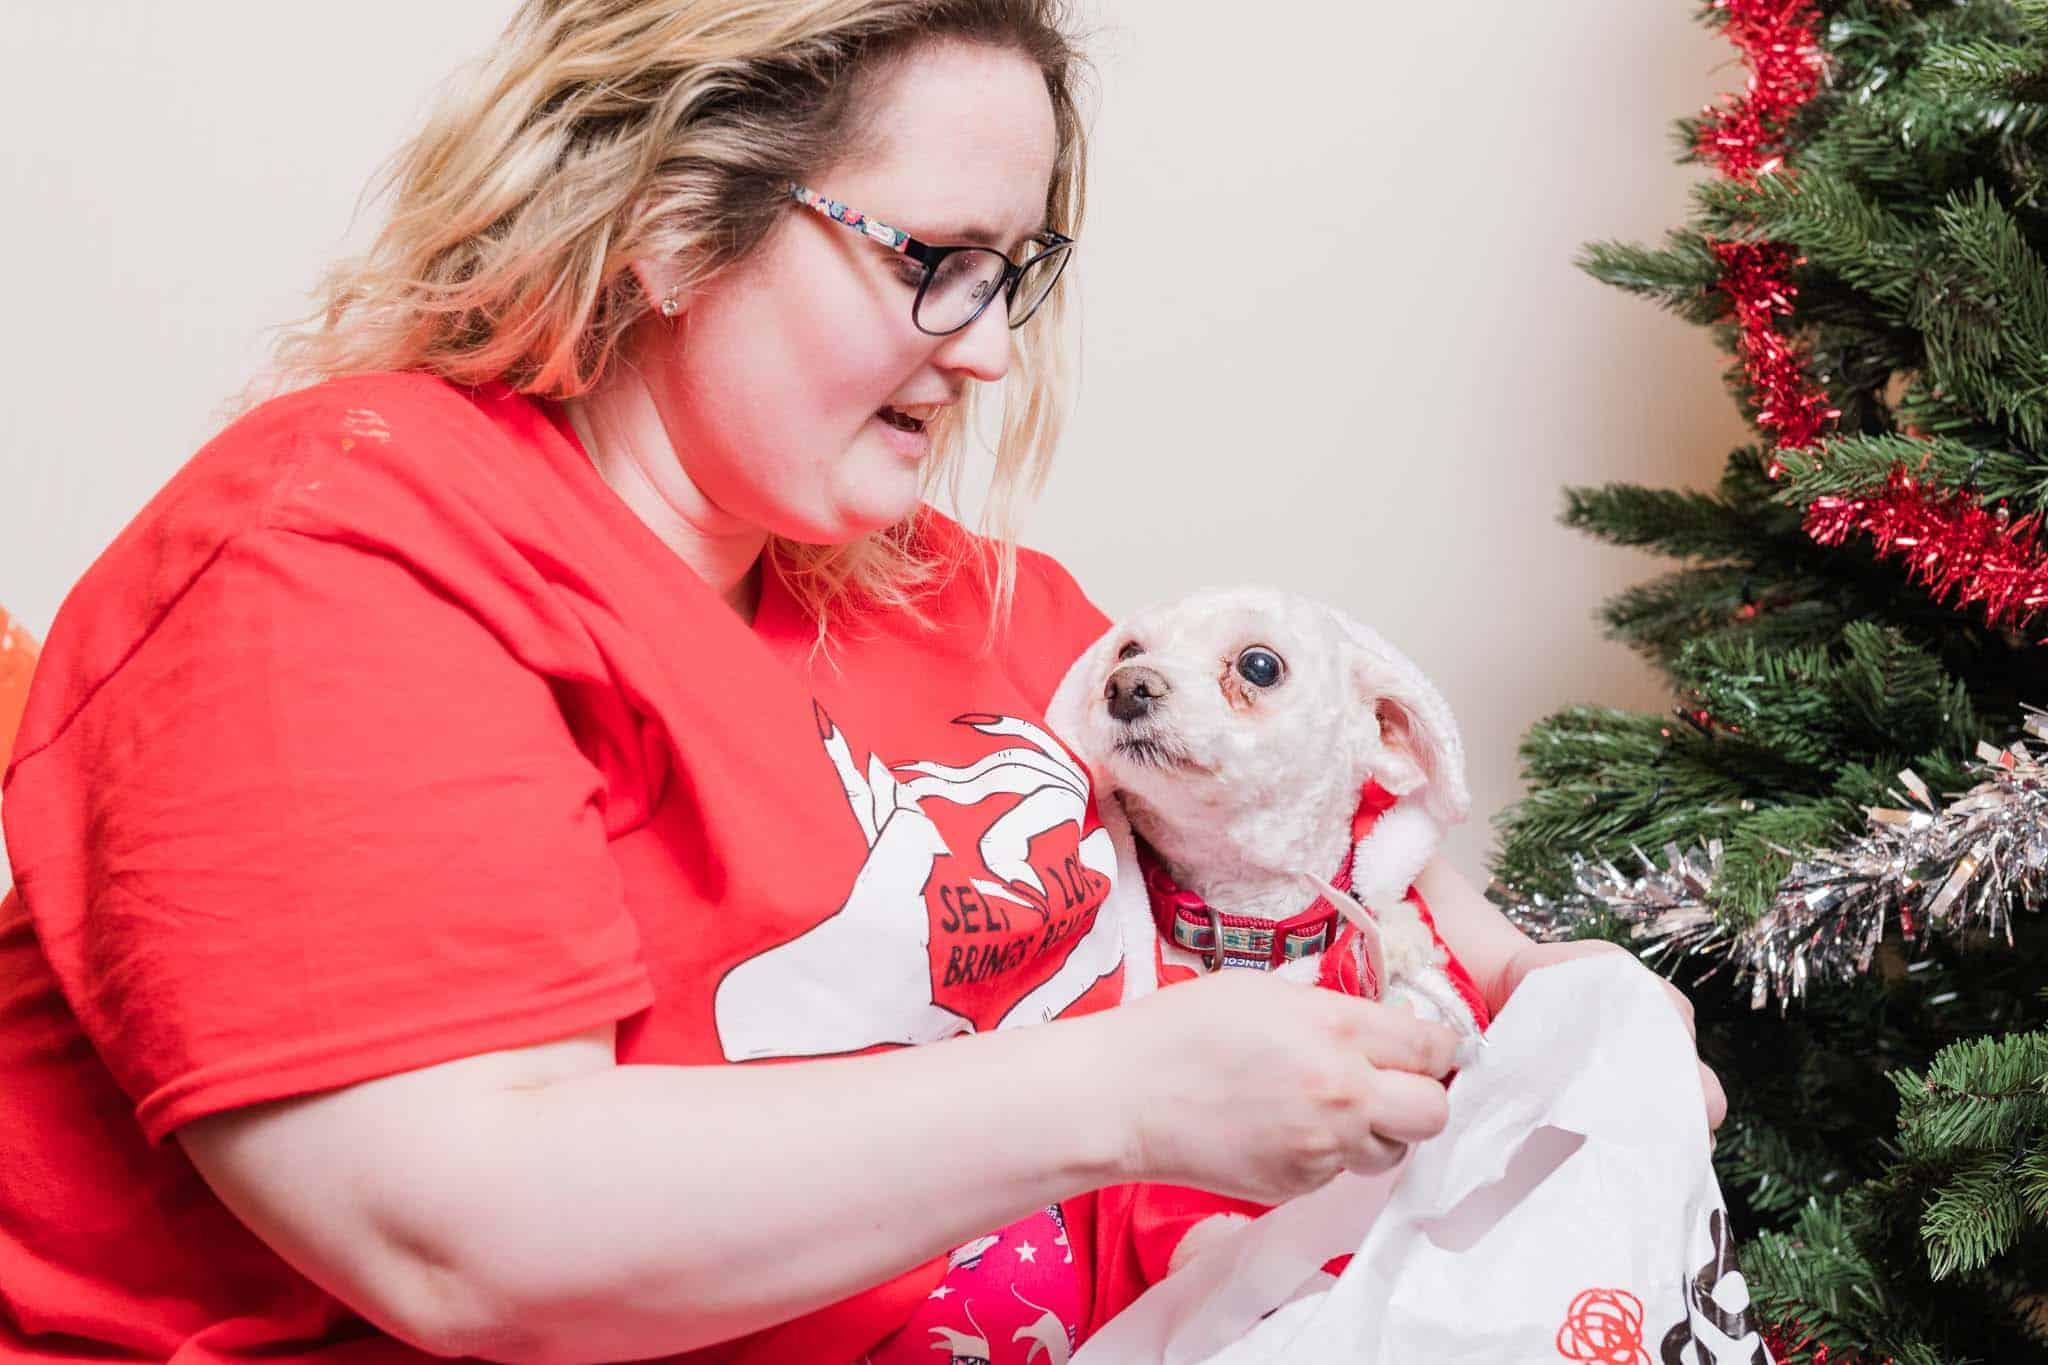 christmas presents at the festive season